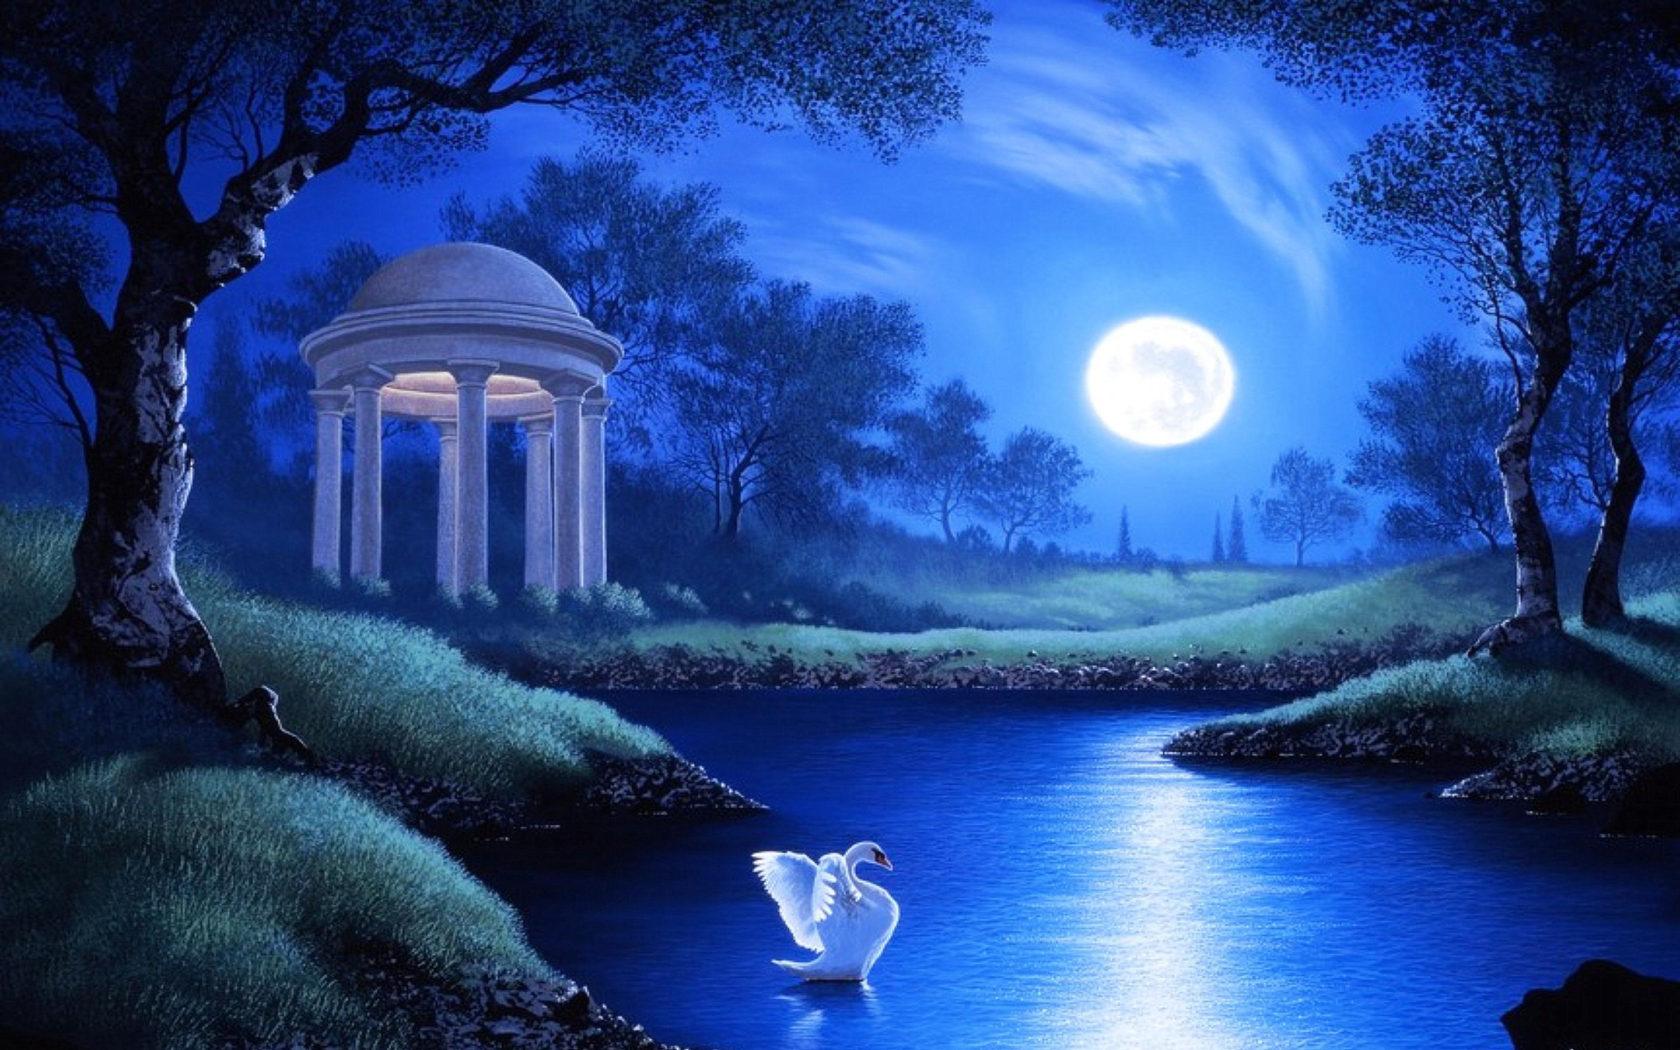 Animated Peacock Wallpapers Swan Lake Night Full Moon Trees Grass Hd Wallpaper